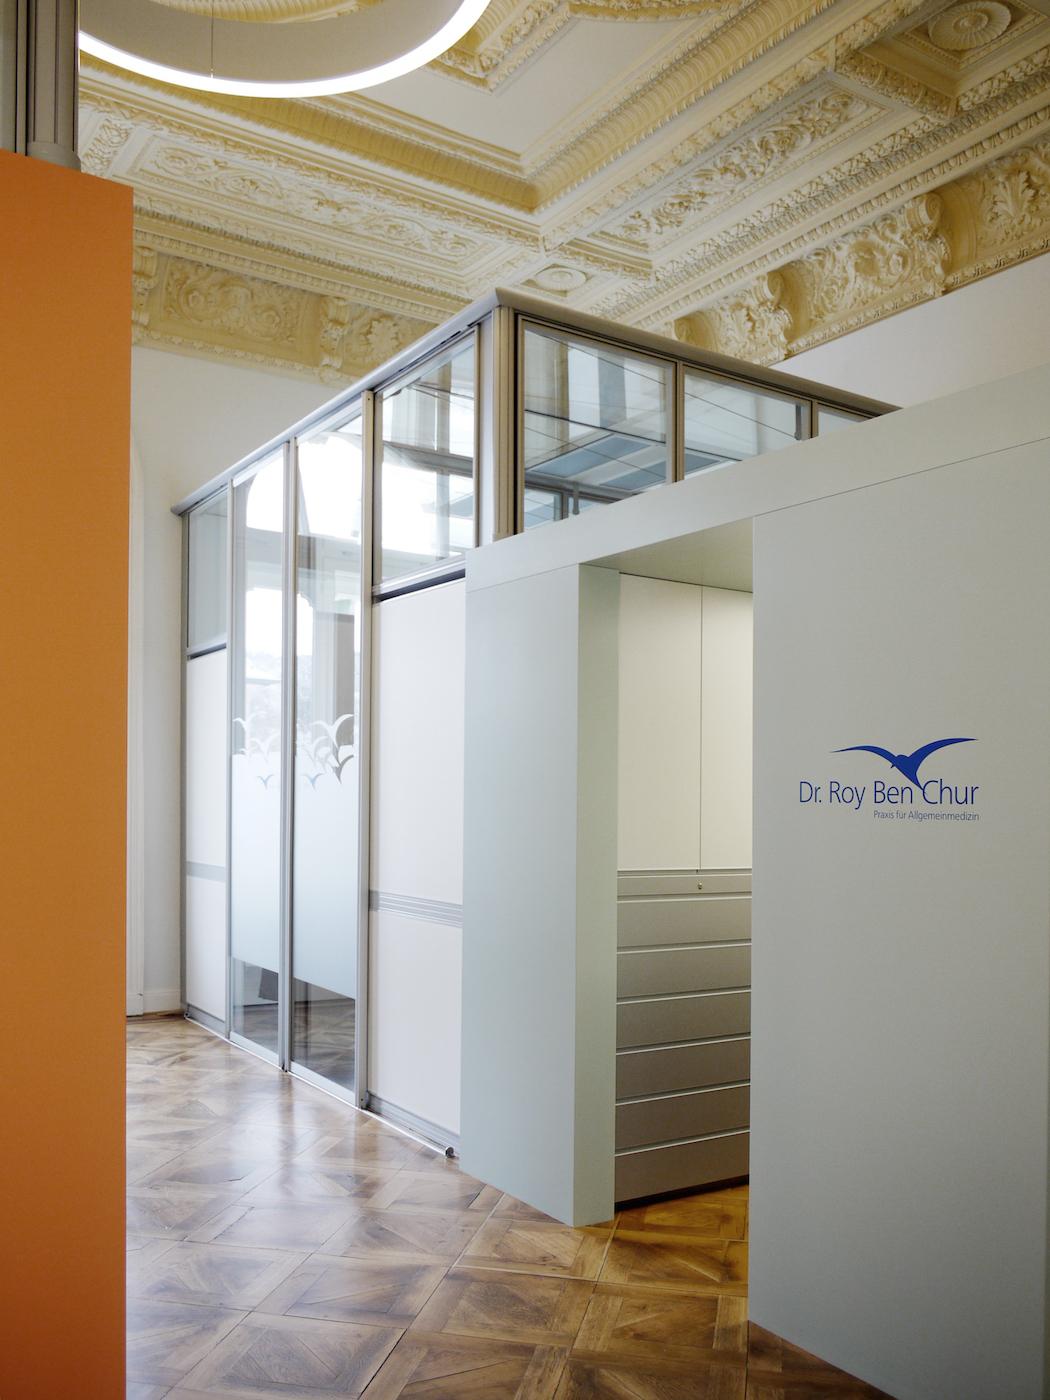 Innenarchitektur Chur dr ben chur büro für design innenarchitektur